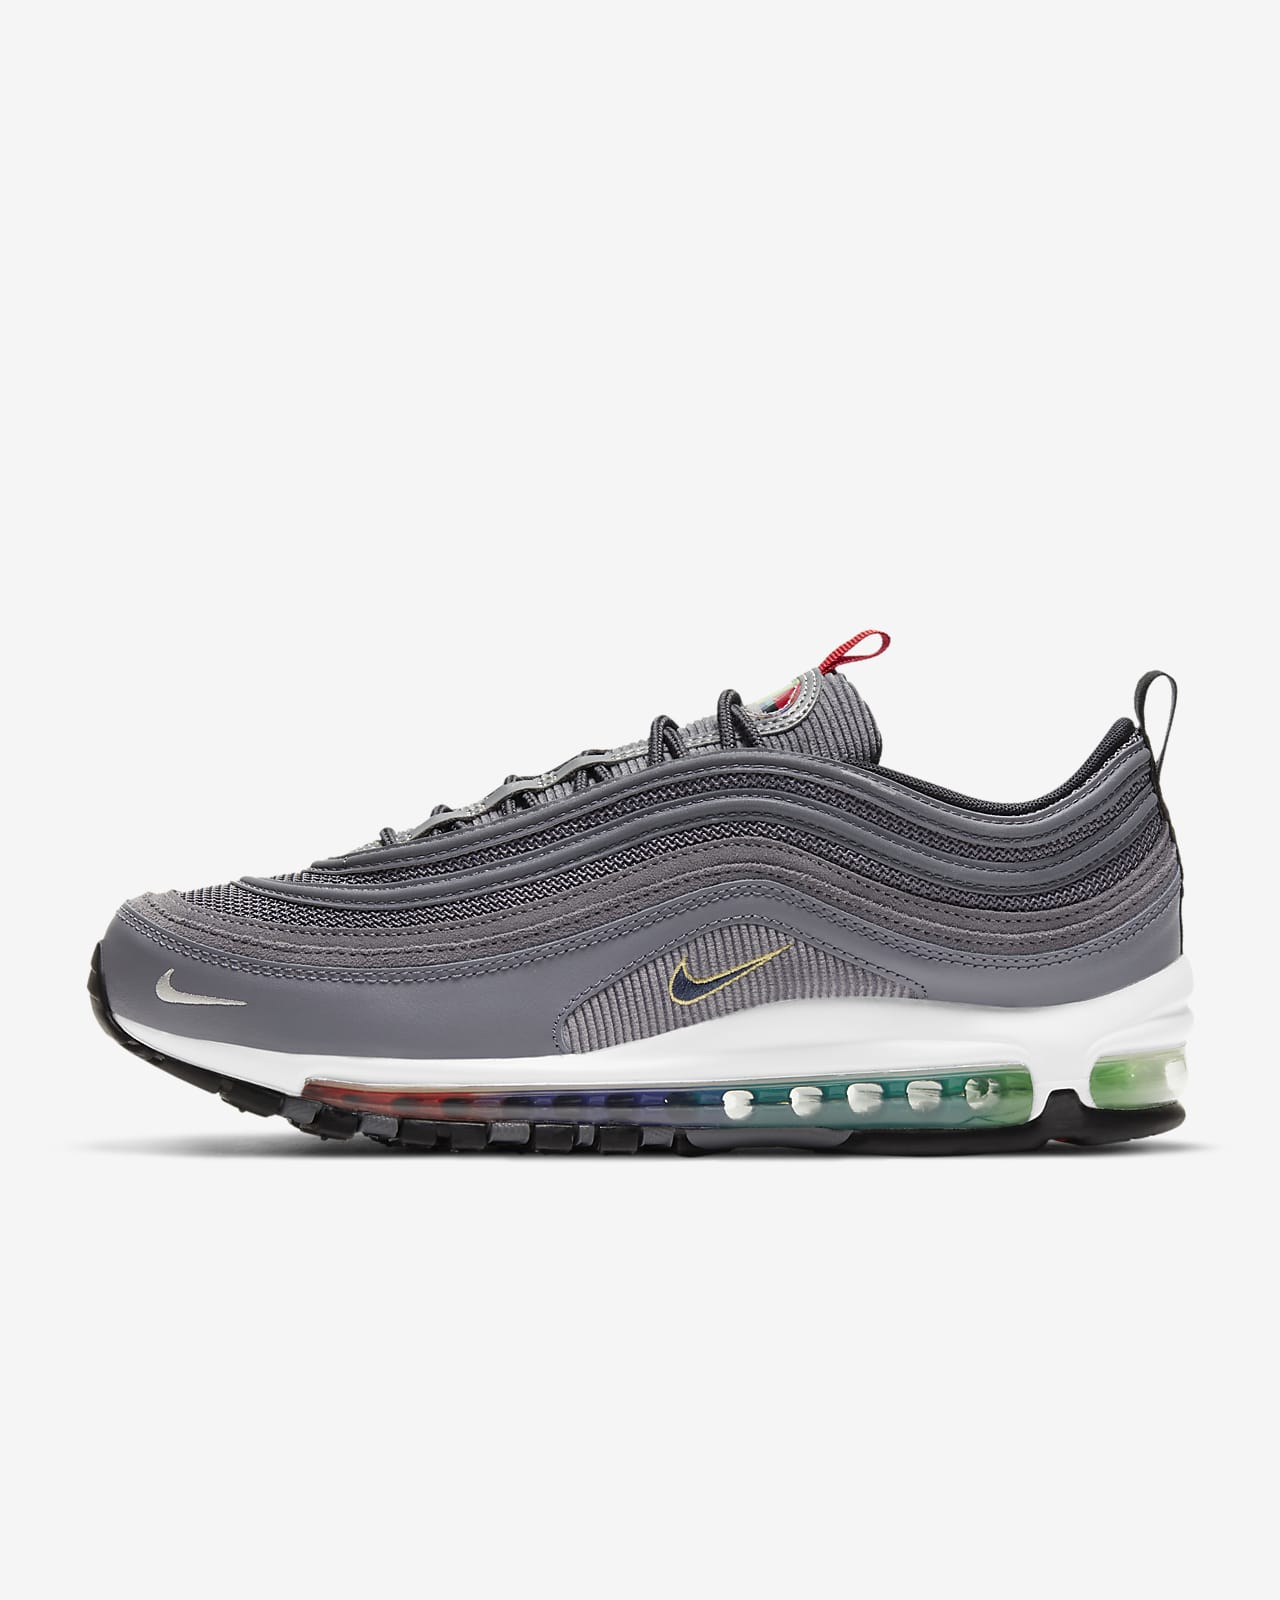 Chaussure Nike Air Max 97 EOI pour Homme